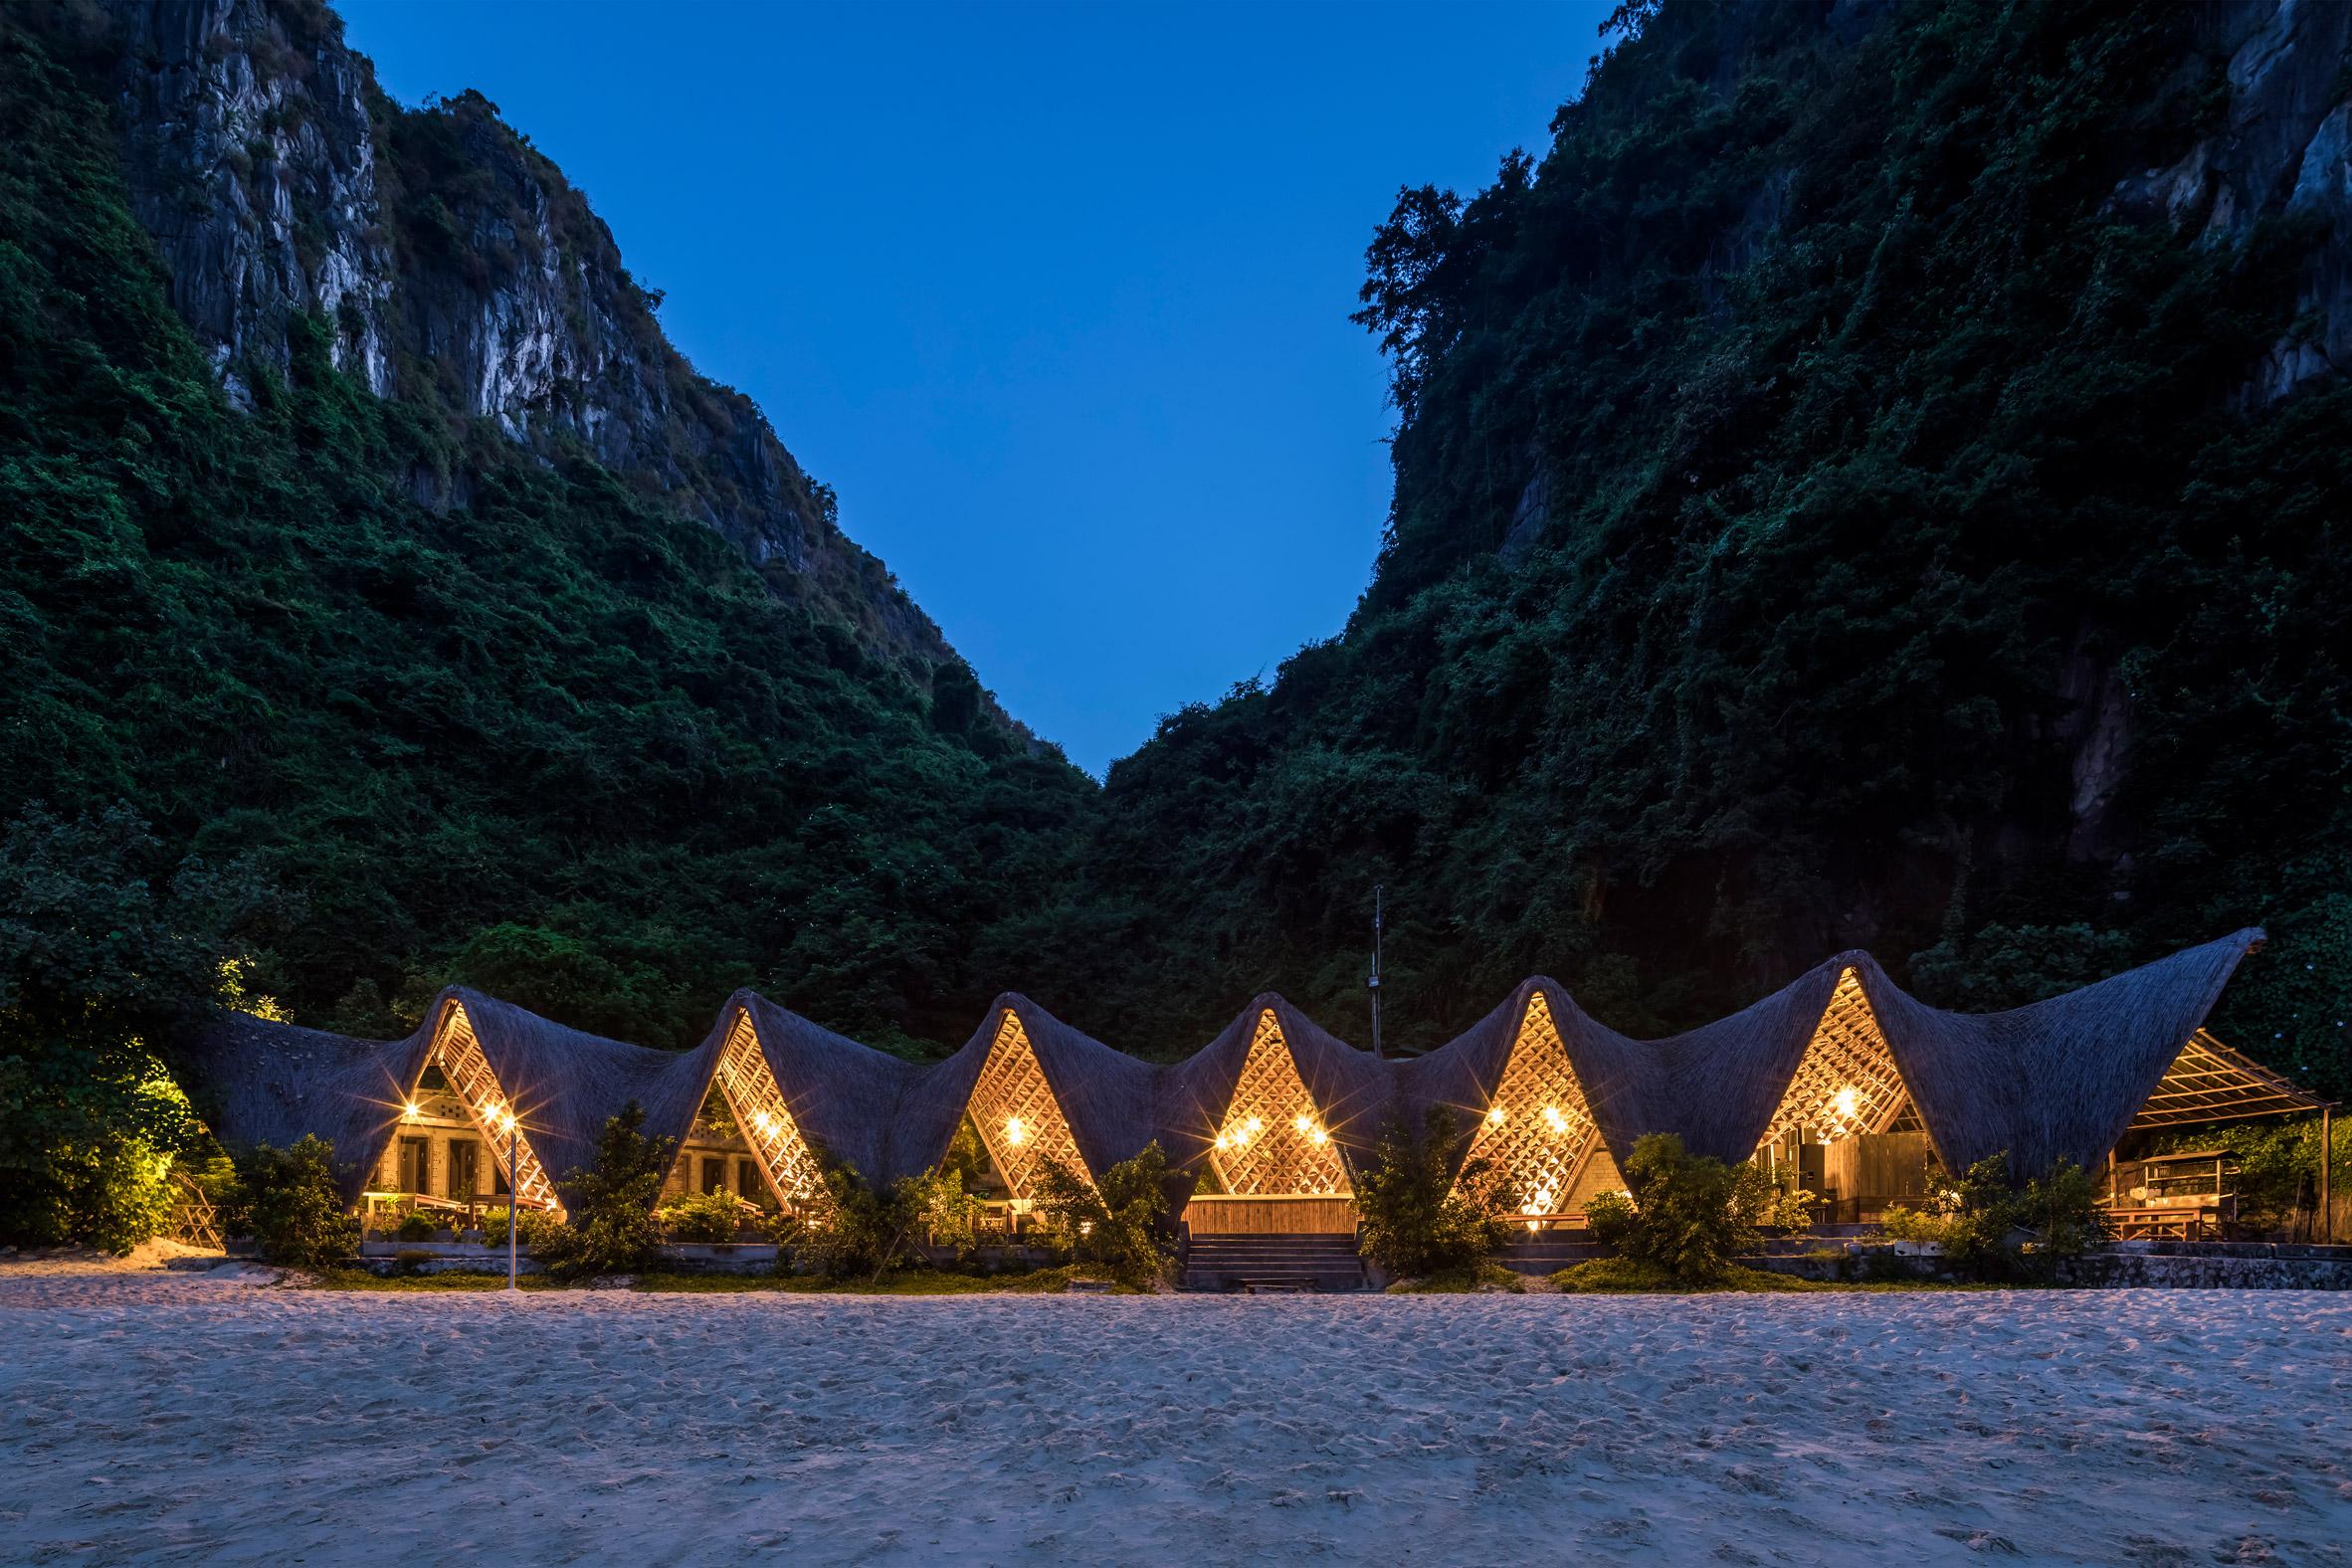 Thiết kế Resort biển 22